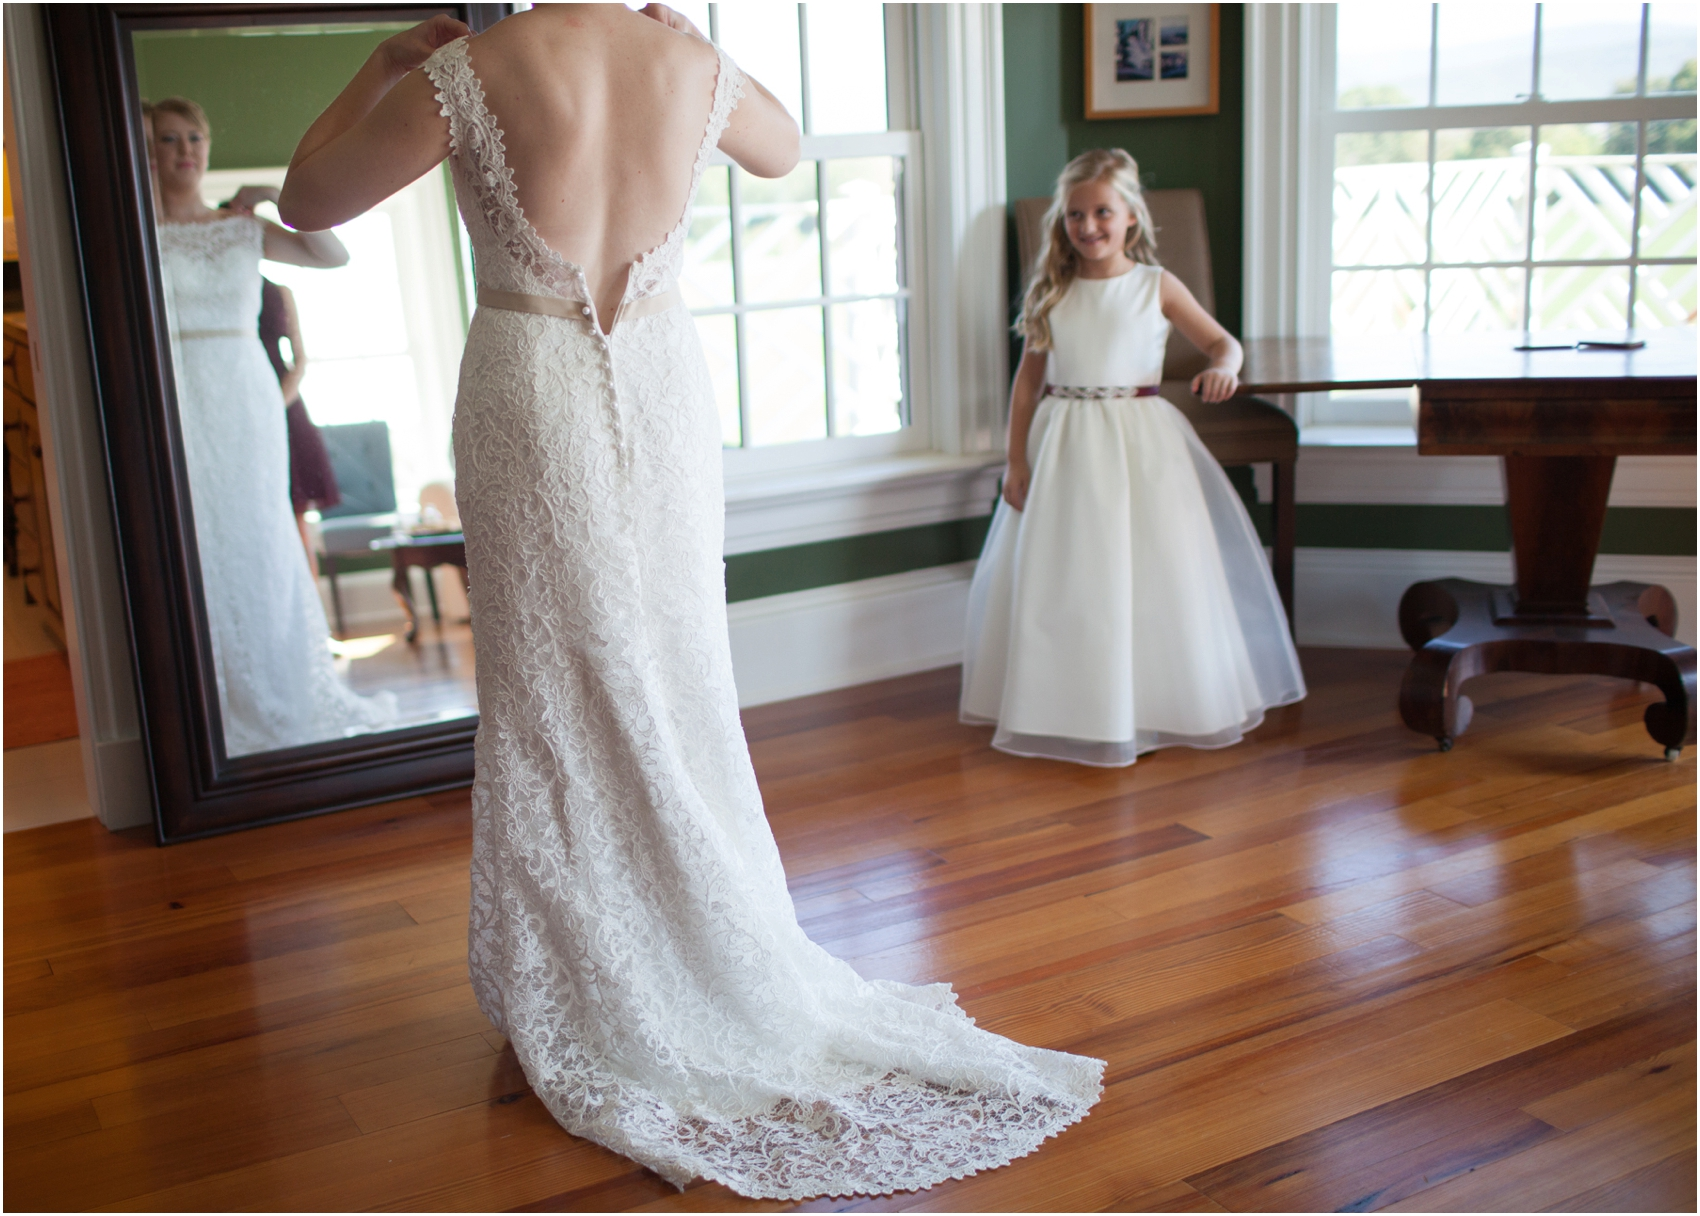 Columns-at-Six-Penny-Farm-Virginia-Fall-Wedding-7793.jpg